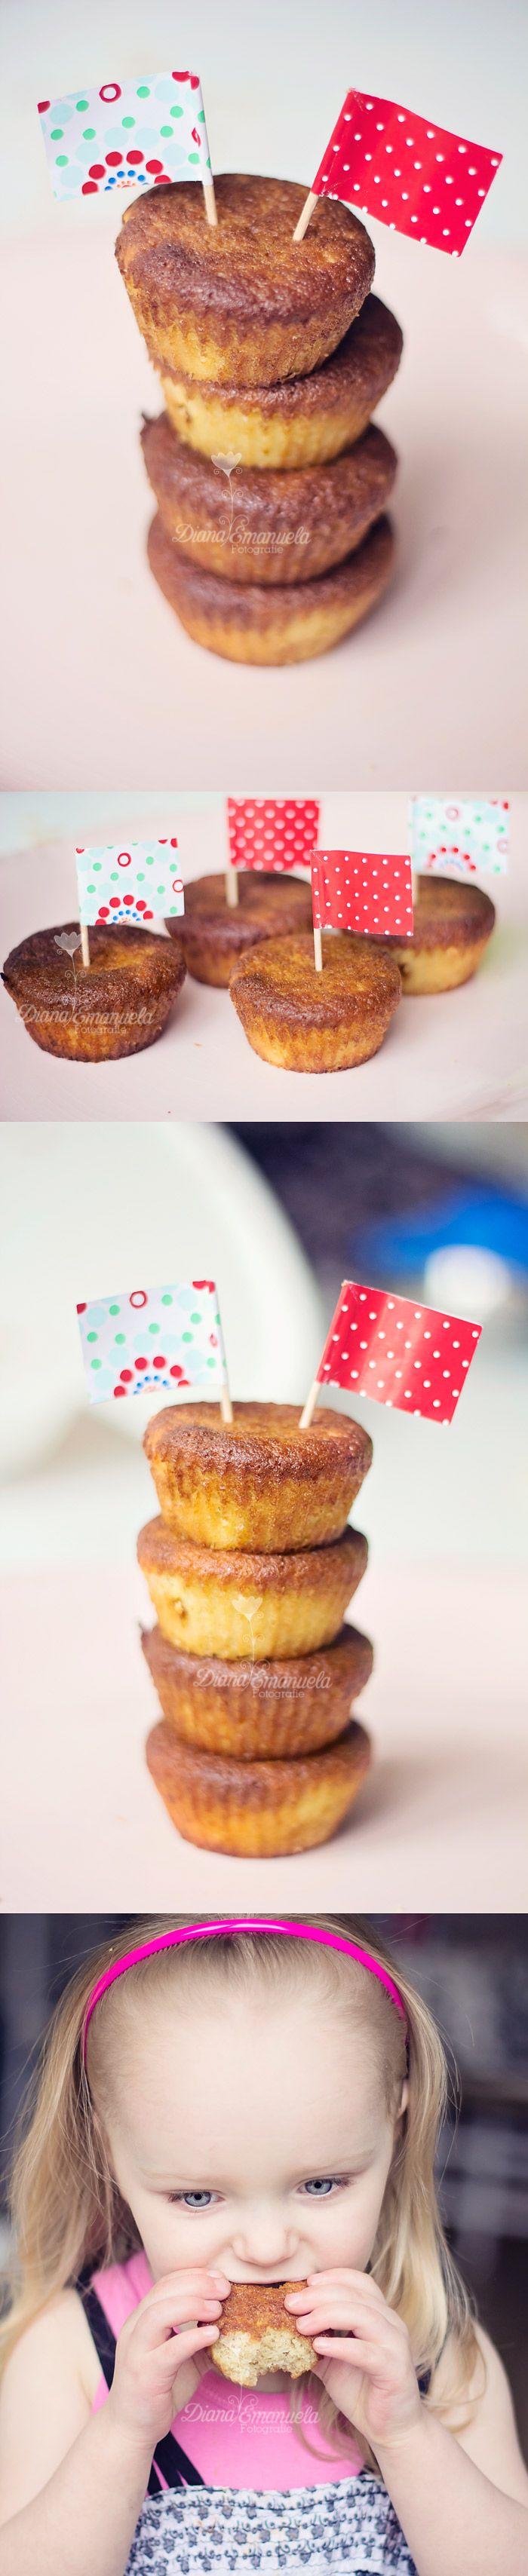 Amandelmeel citroen cupcake